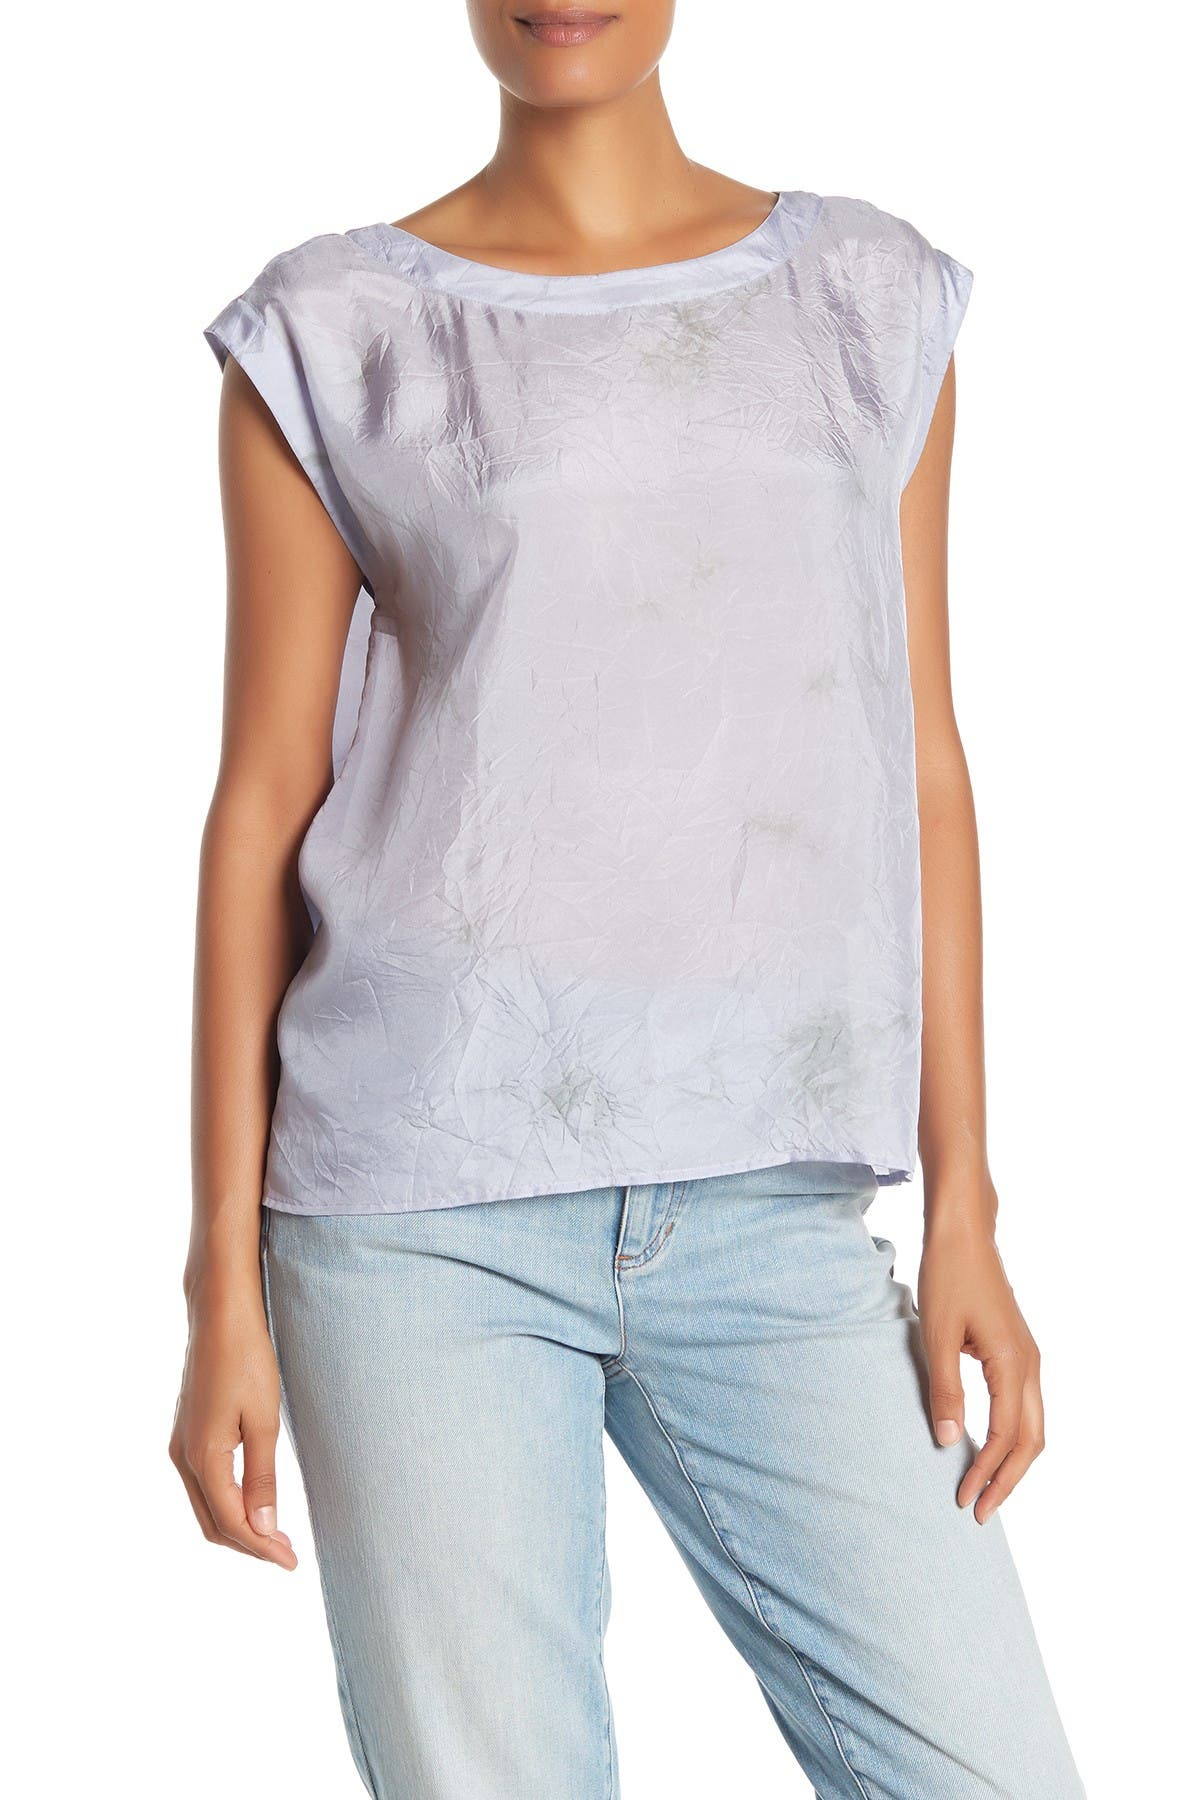 Image of Eileen Fisher Jewel Neck Silk Short Sleeve Blouse